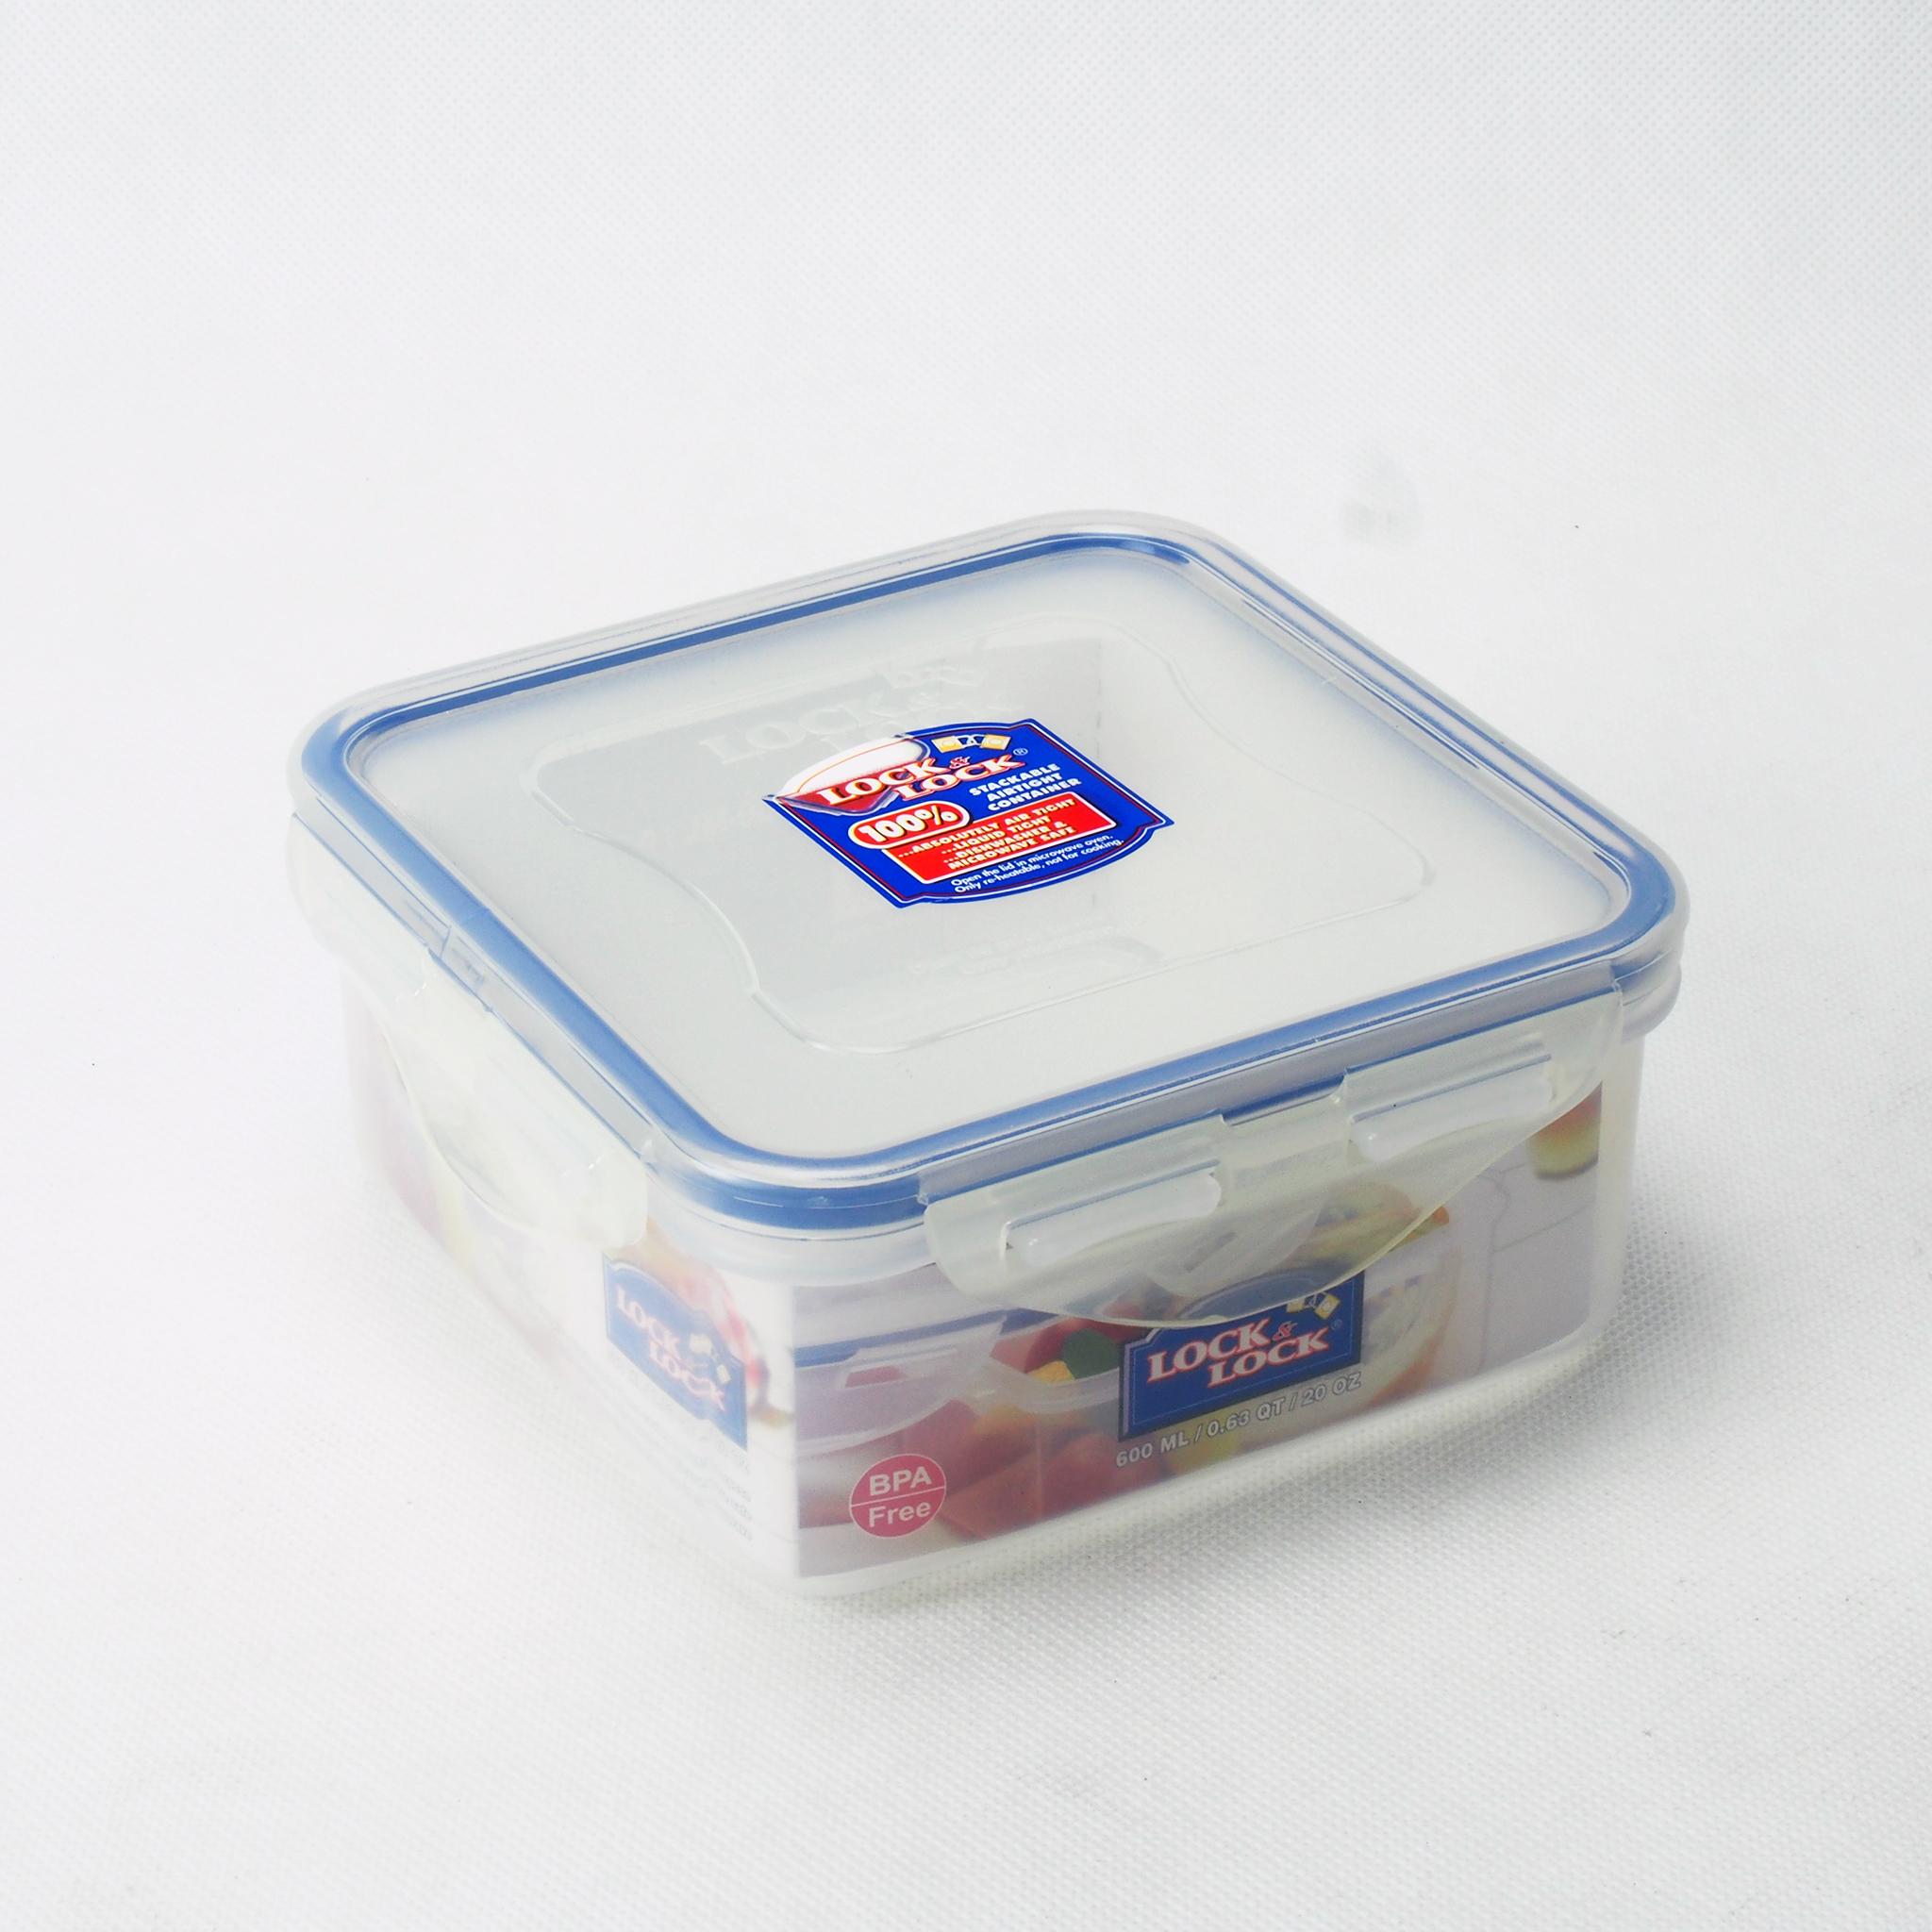 Food storage box 600 ml.